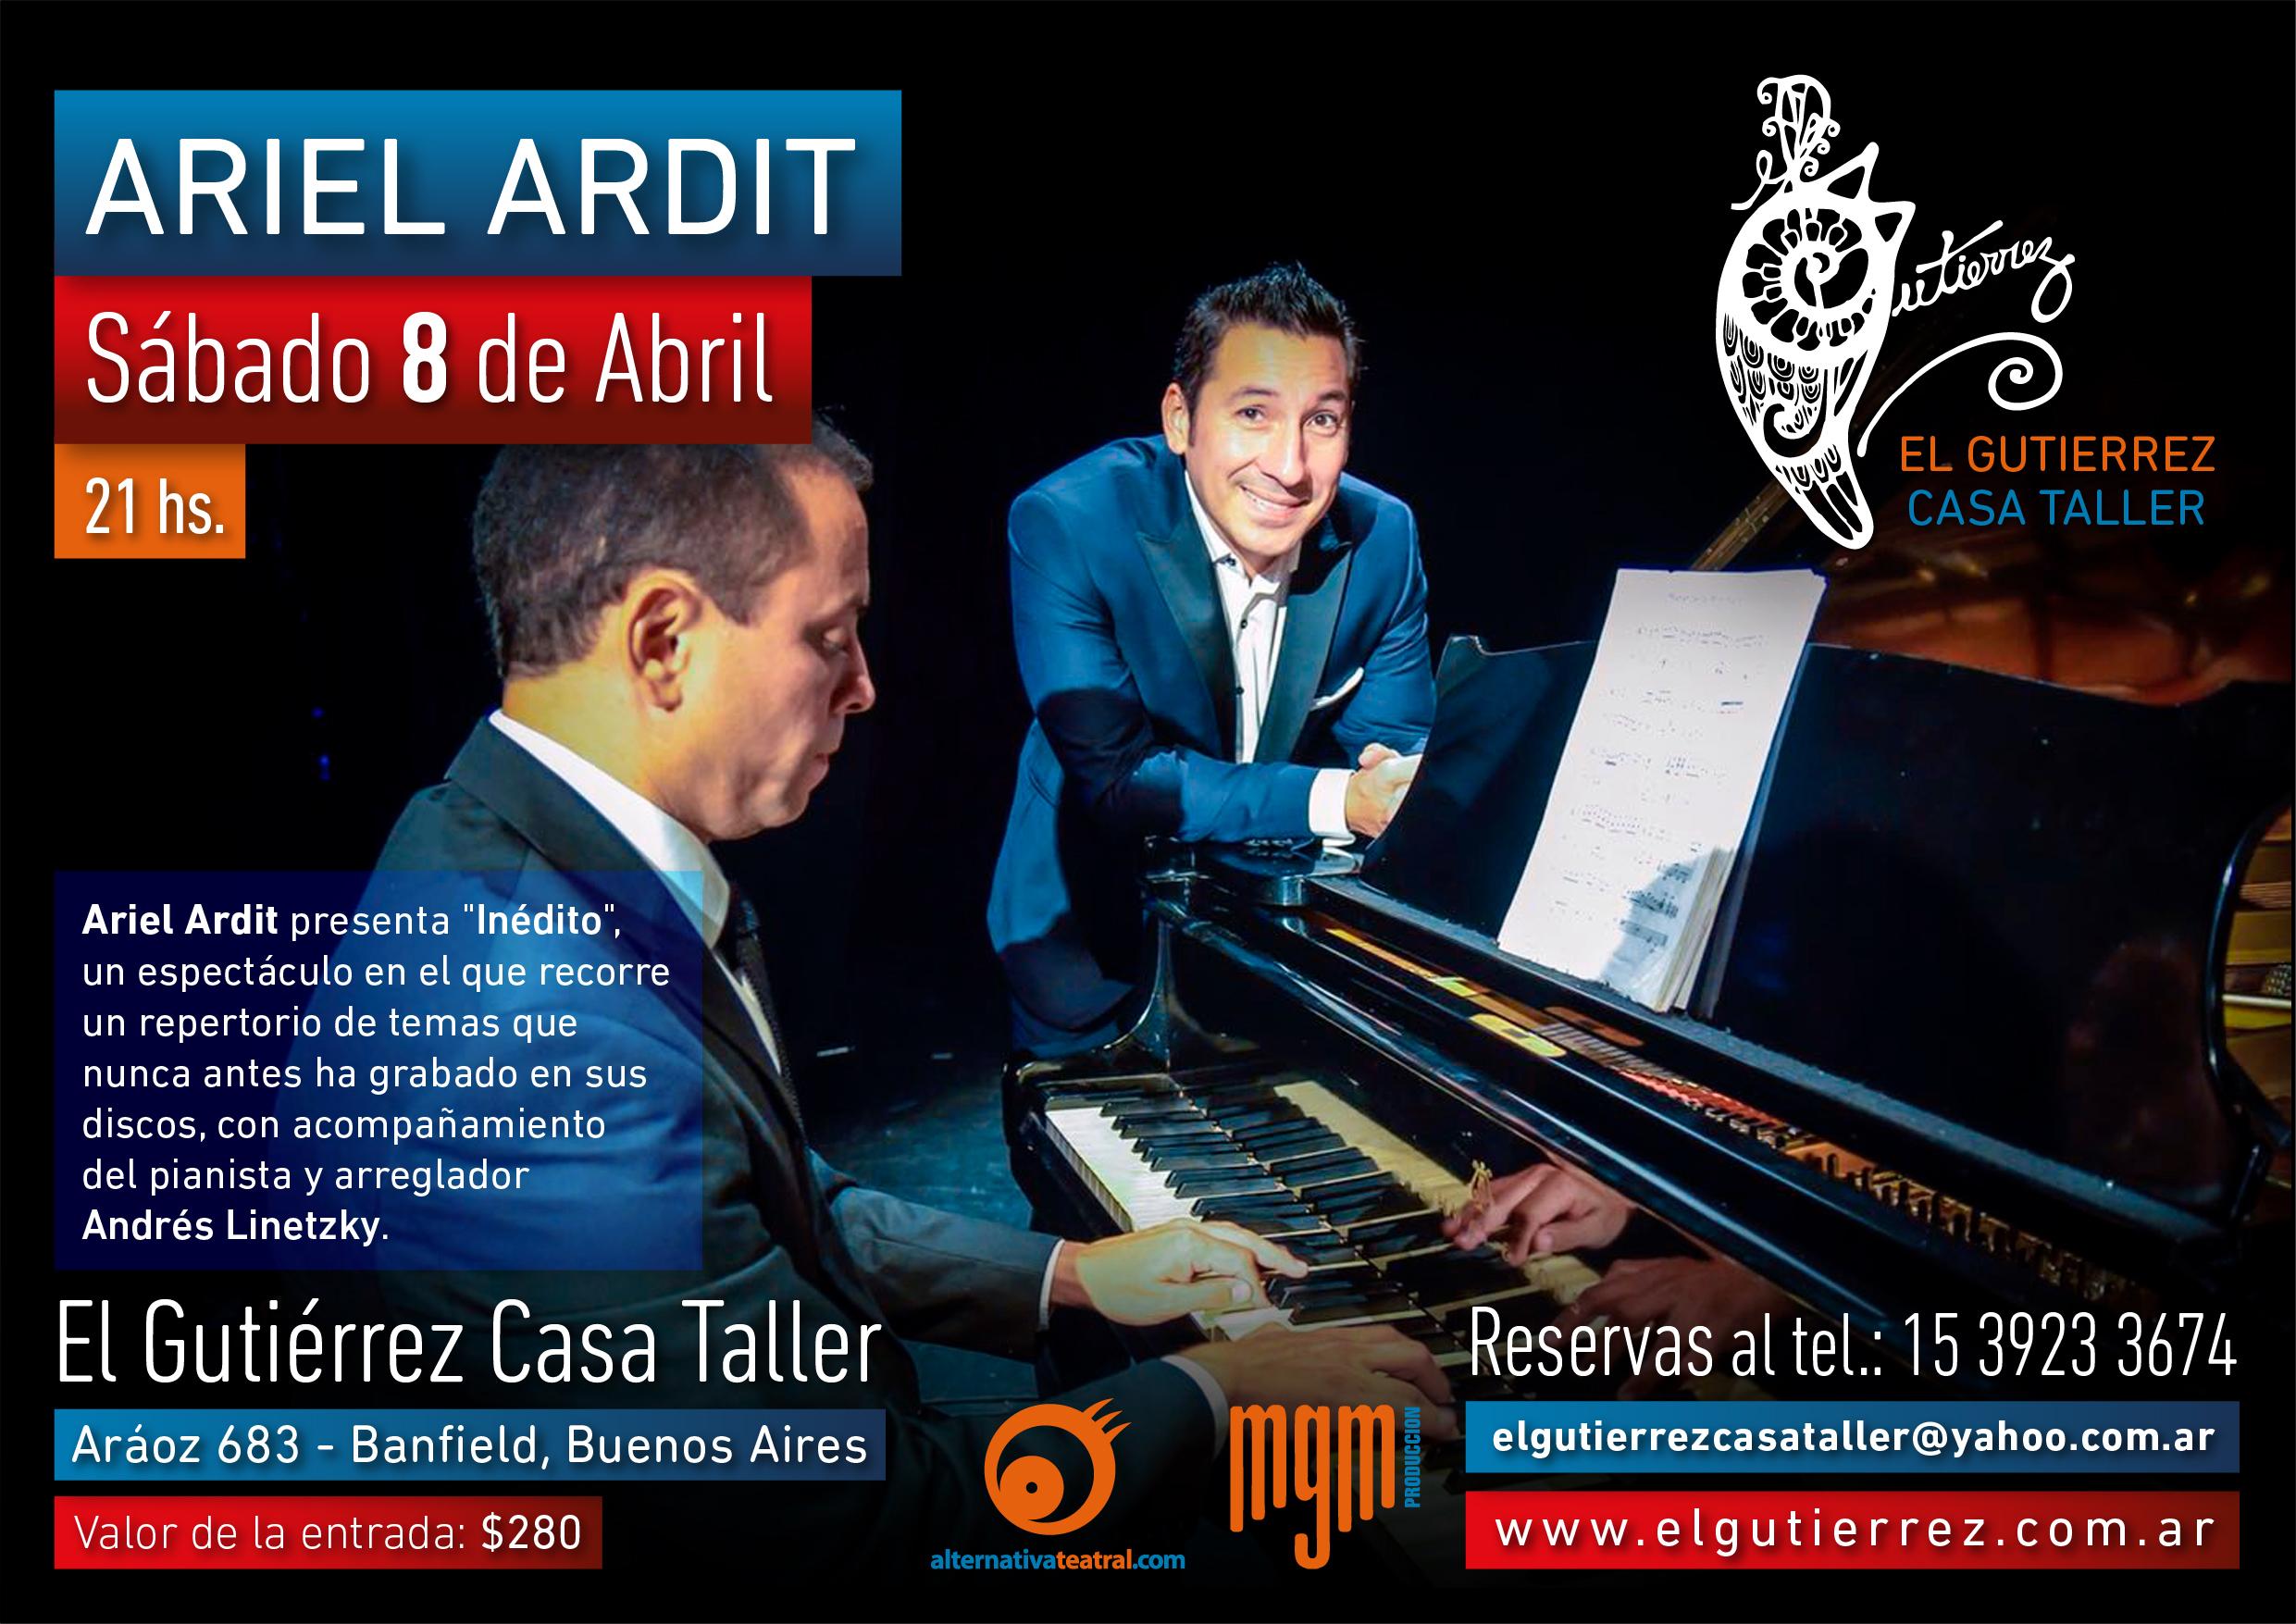 Ariel Ardit